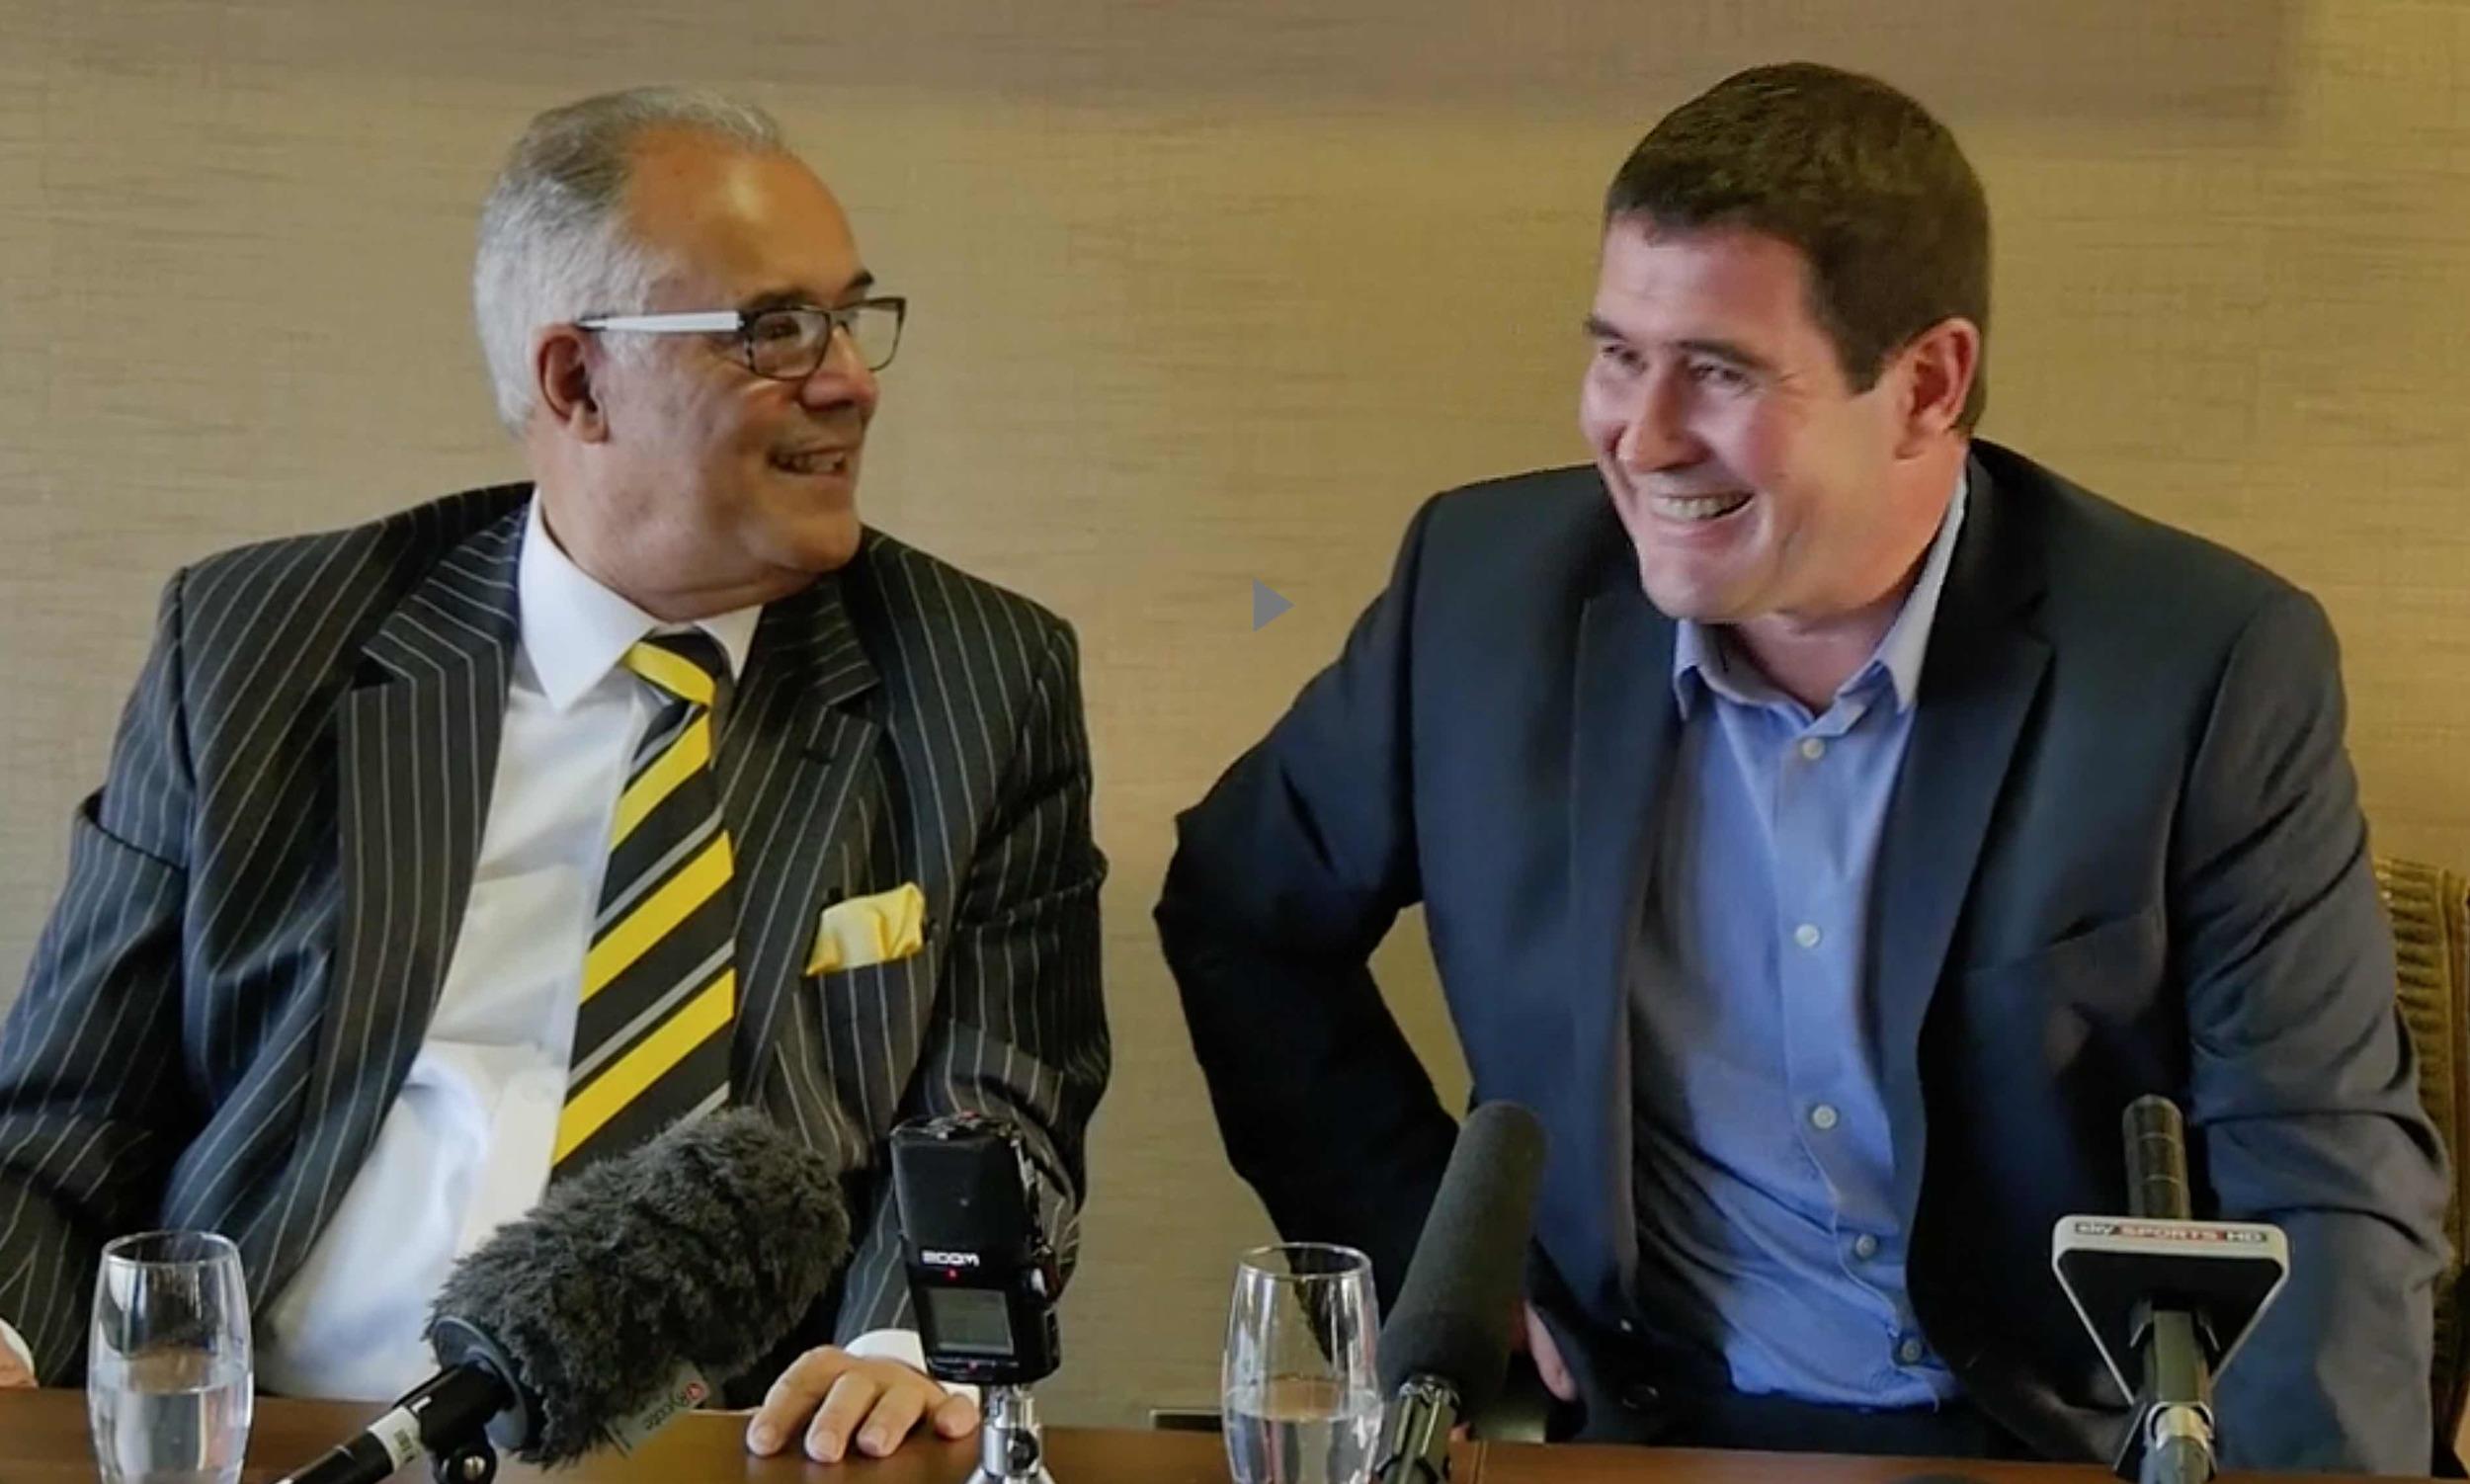 ALL SMILES:  NIGEL CLOUGH WITH BURTON CHAIRMAN BEN ROBINSON